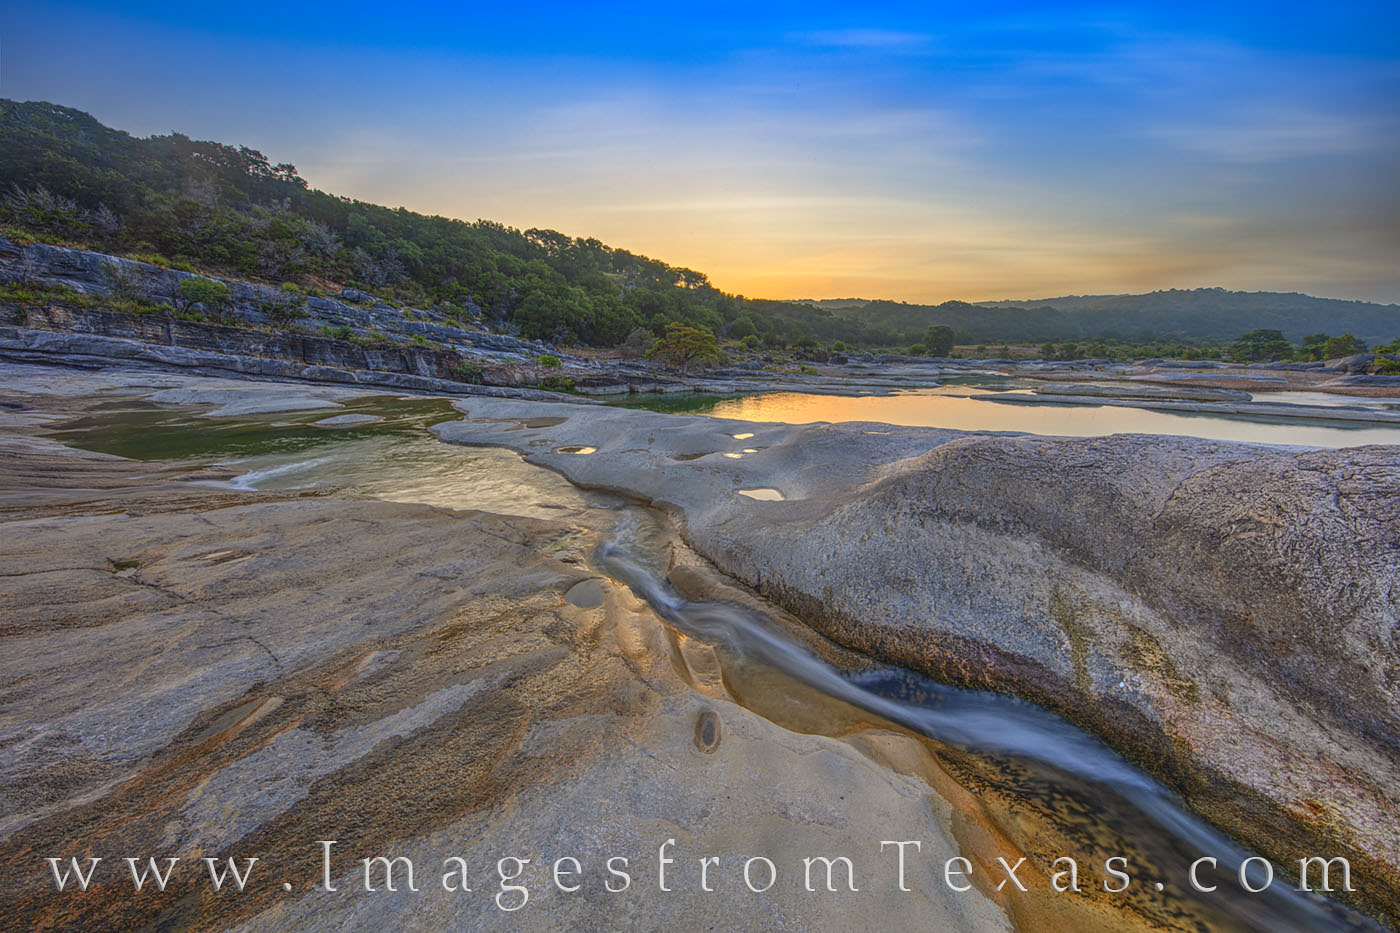 Texas hill country, pedernales river, sunrise, morning, summer, limestone, state park, pedernales falls, sunburst, august, solitude, photo